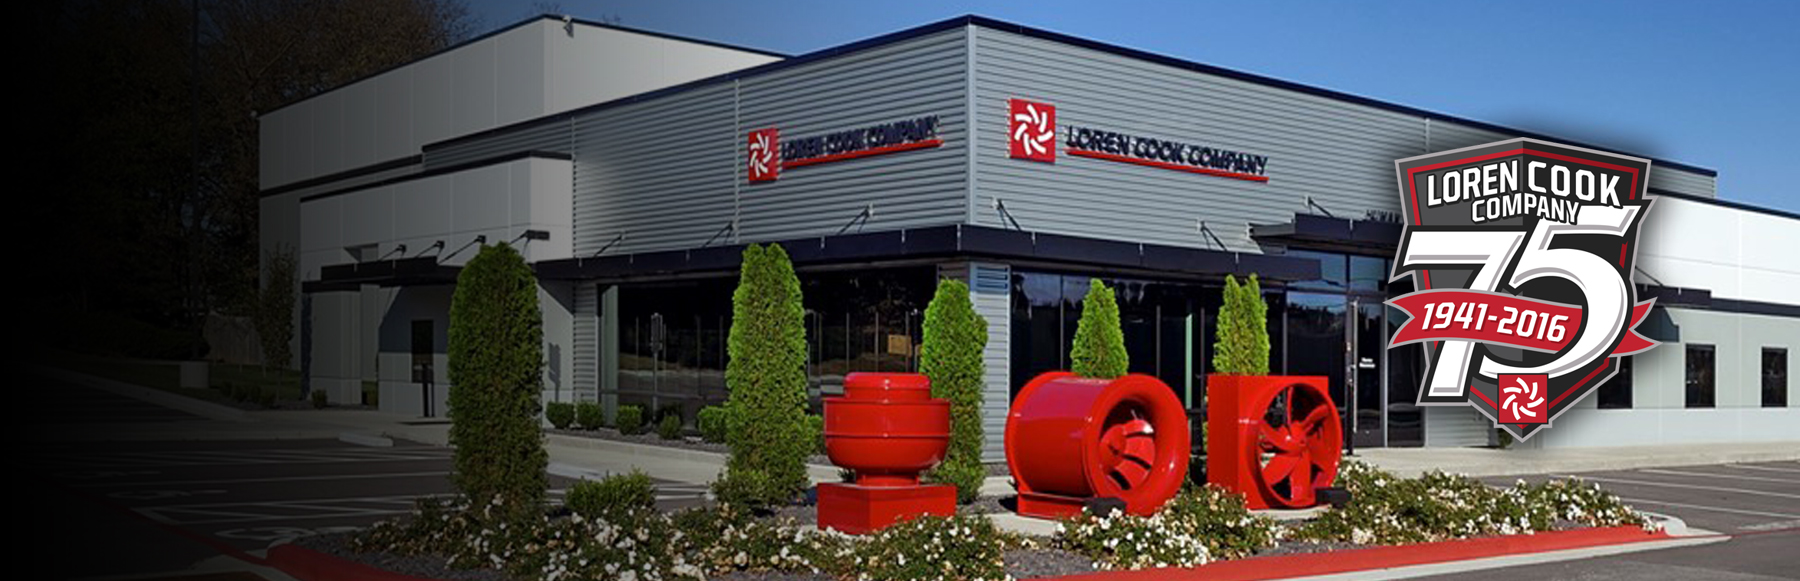 Texas Air Products Manufacturer Representative For Hvac San